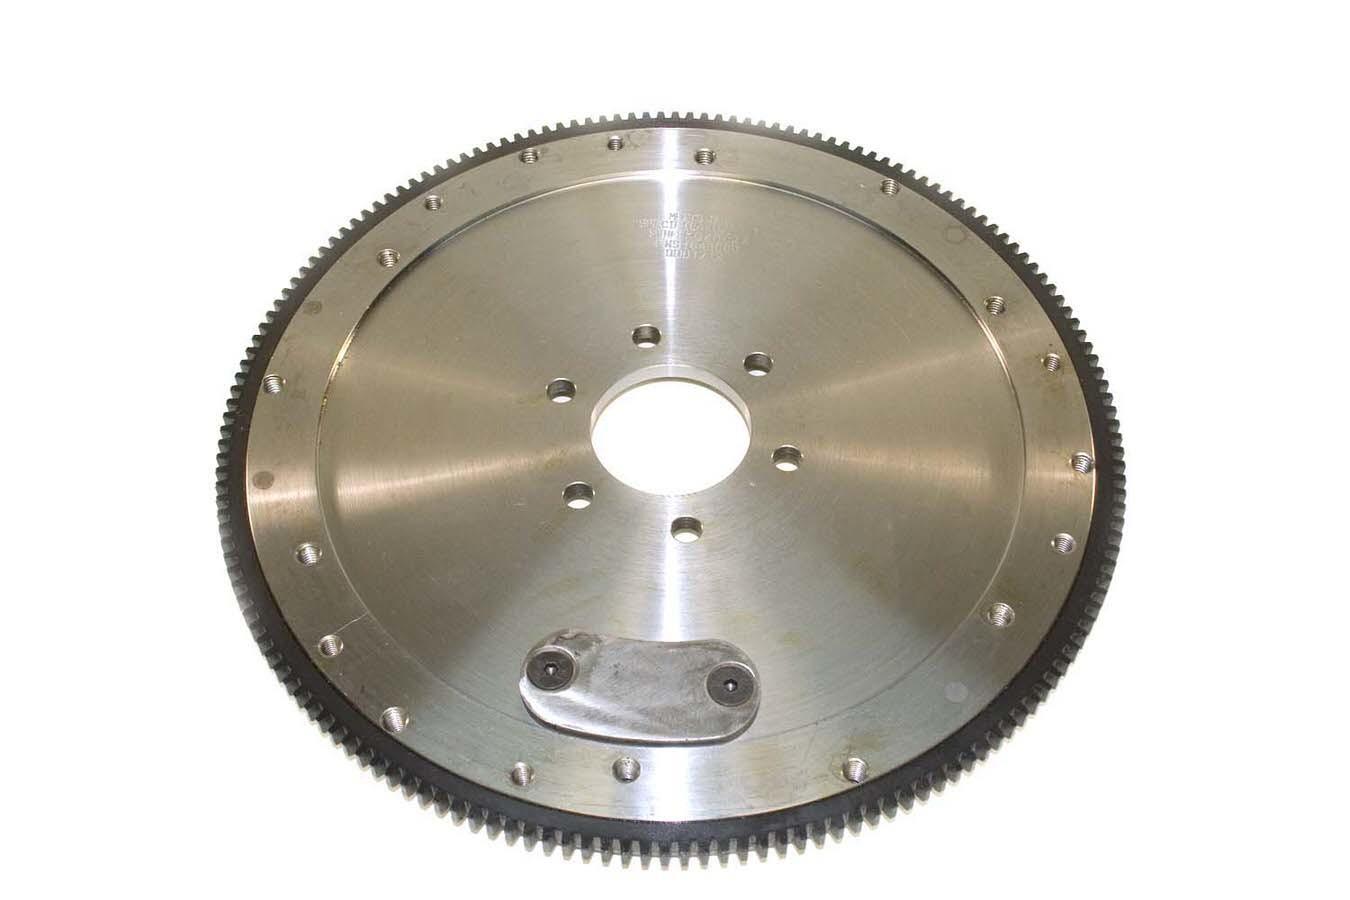 PRW Industries 1645580 Flywheel, 166 Tooth, 30.0 lb, Steel, External Balance, Oldsmobile V8, Each